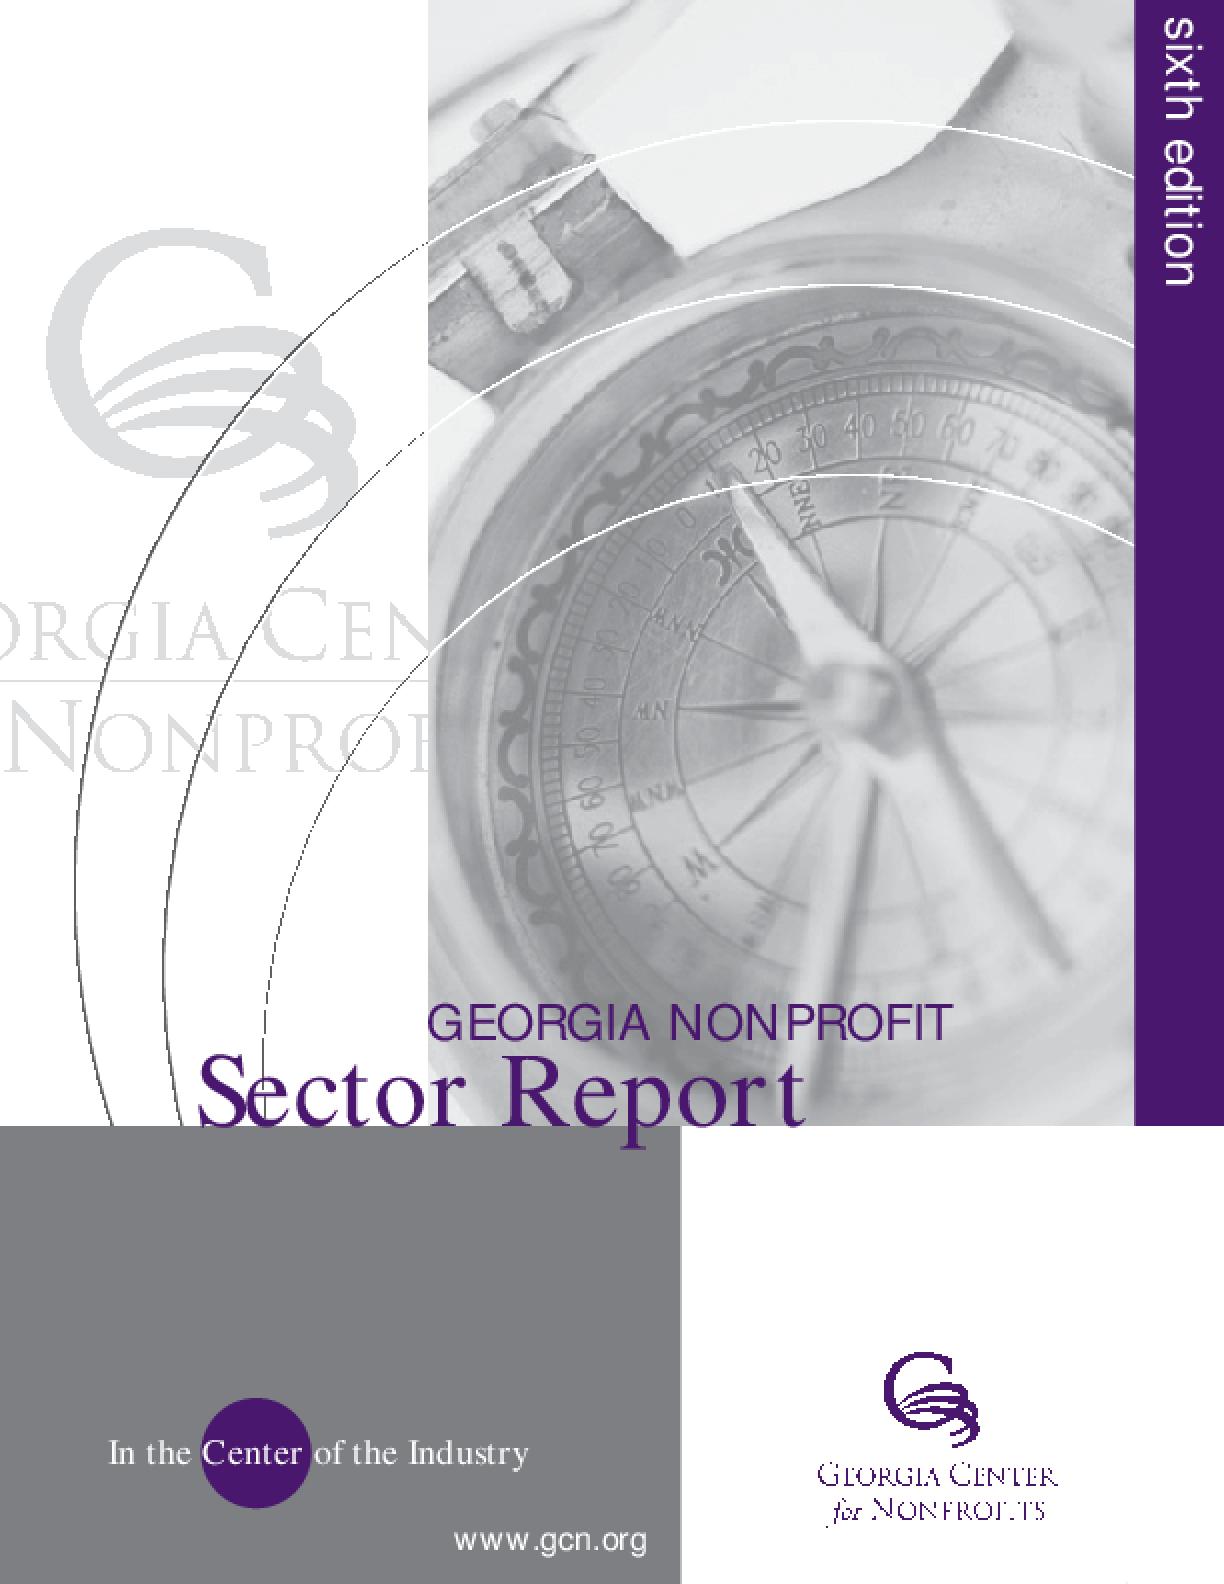 Georgia Nonprofit Sector Report